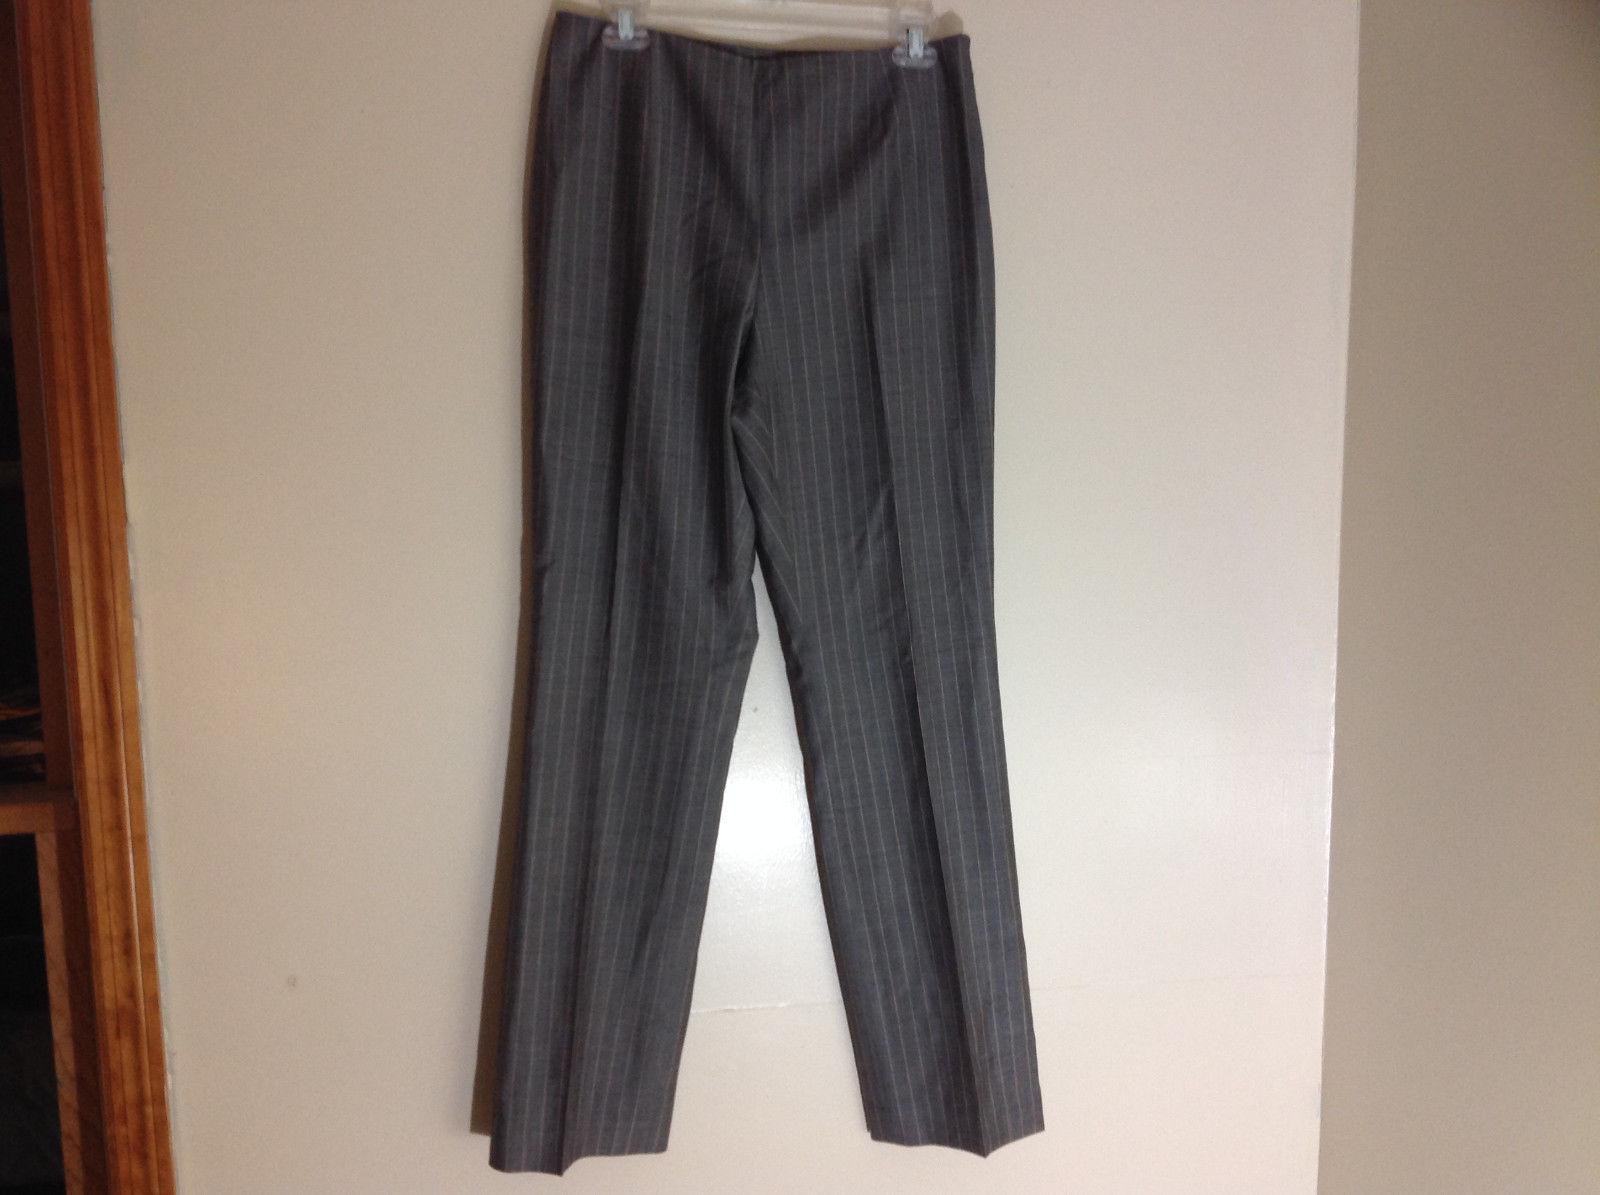 Dana Buchman Gray Pinstriped Dress Pants Zipper Closure on Left Side Size 8